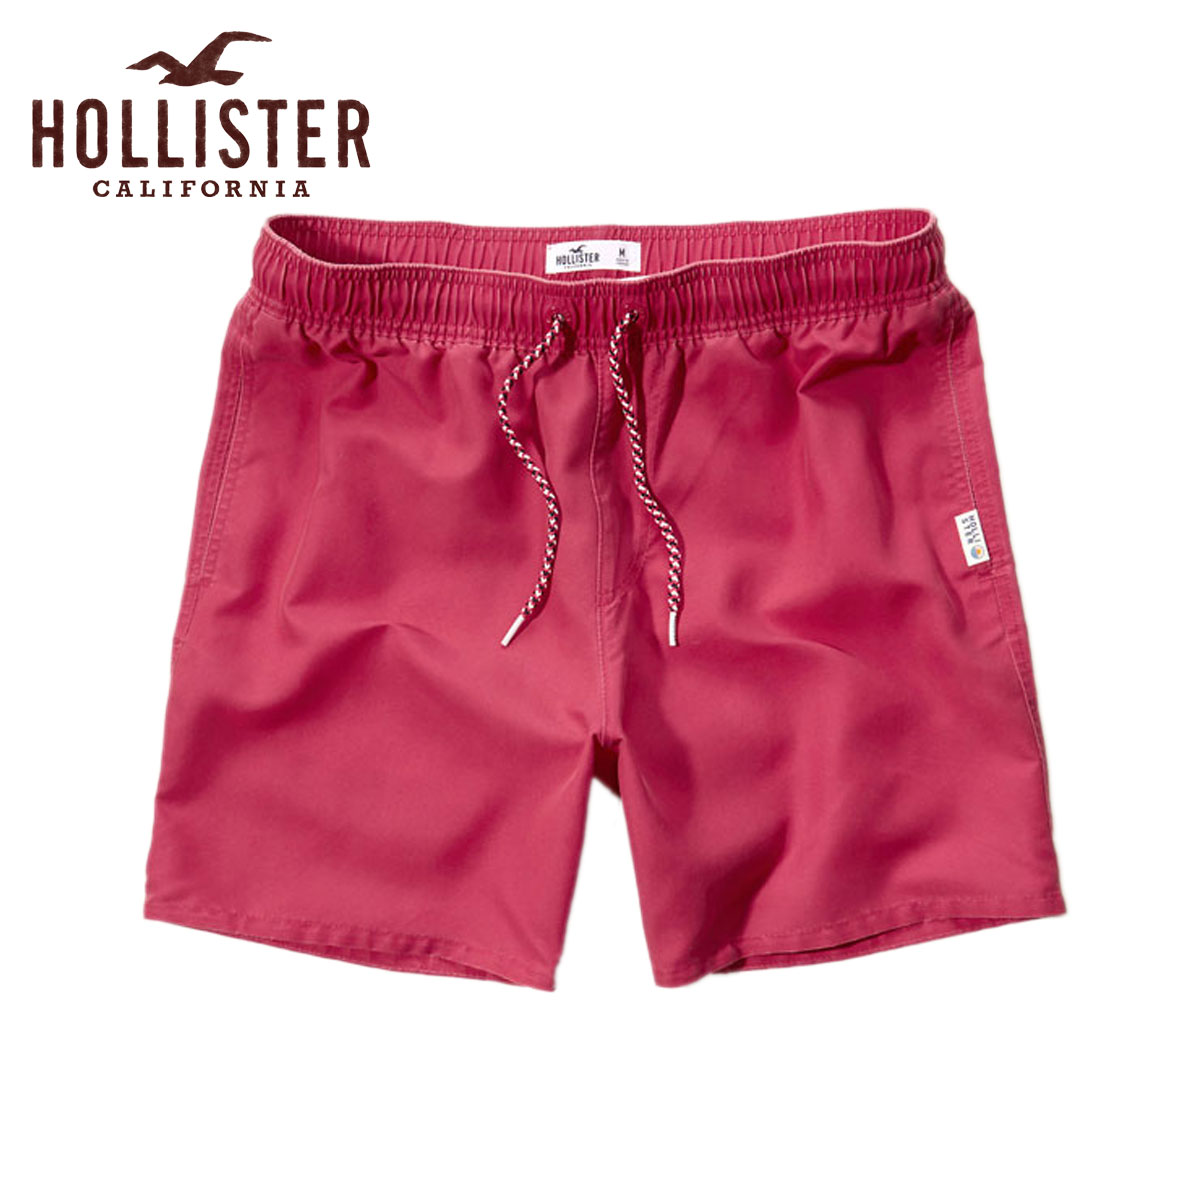 ff4ca90e957d0 Hori star HOLLISTER regular article men swimming underwear swimsuit Beach  To Street Swim Shorts 333- ...